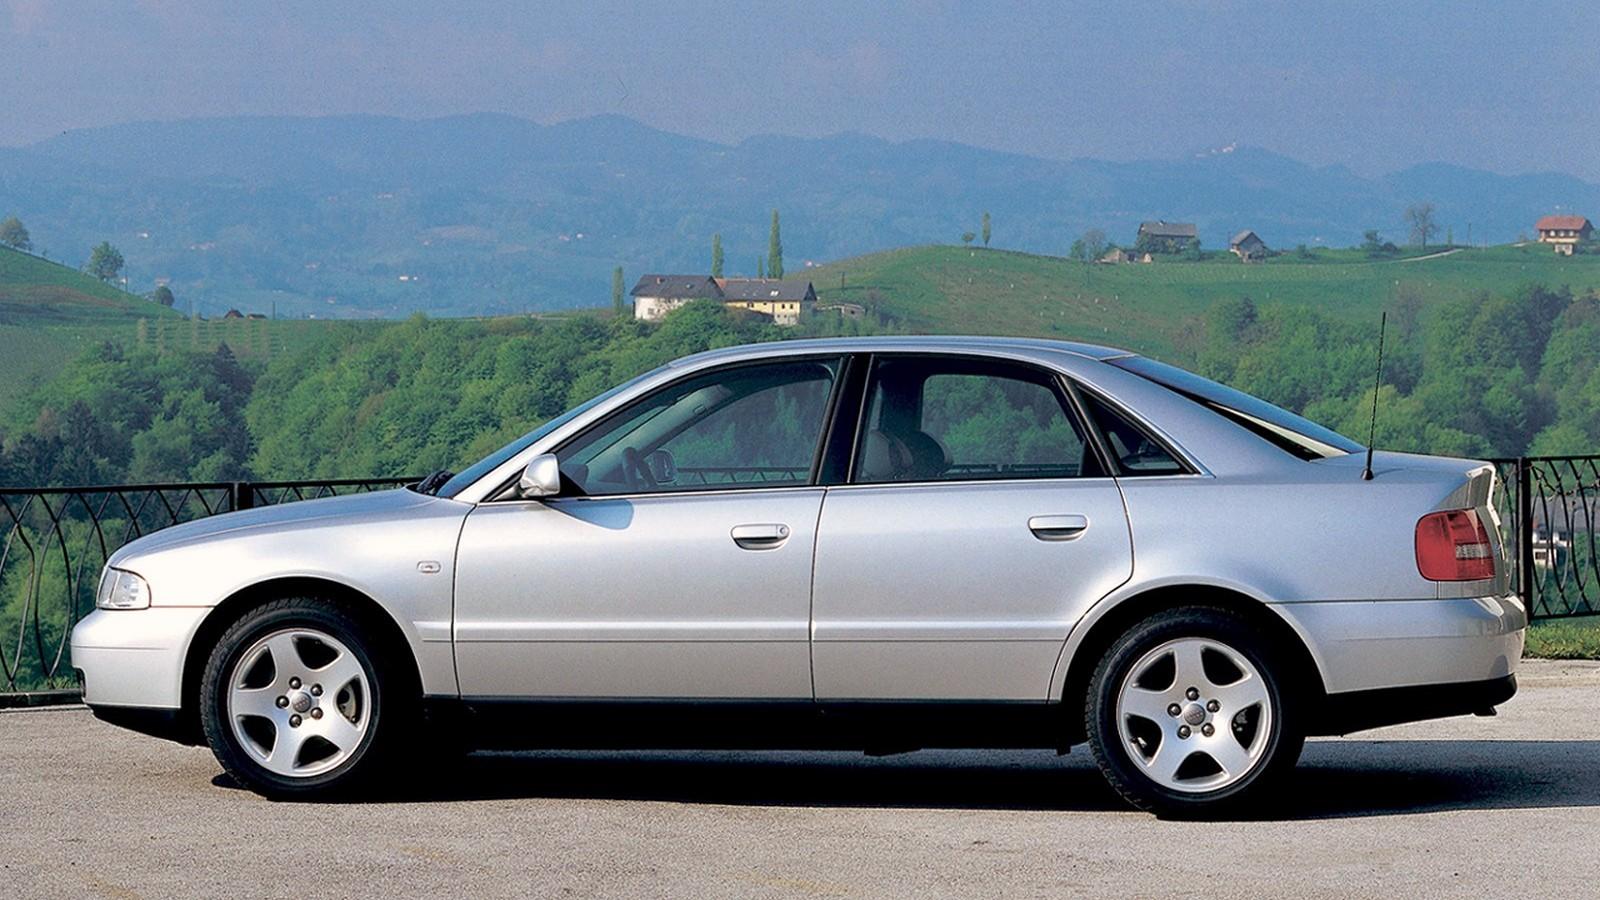 Фото Audi A4 B5 в профиль